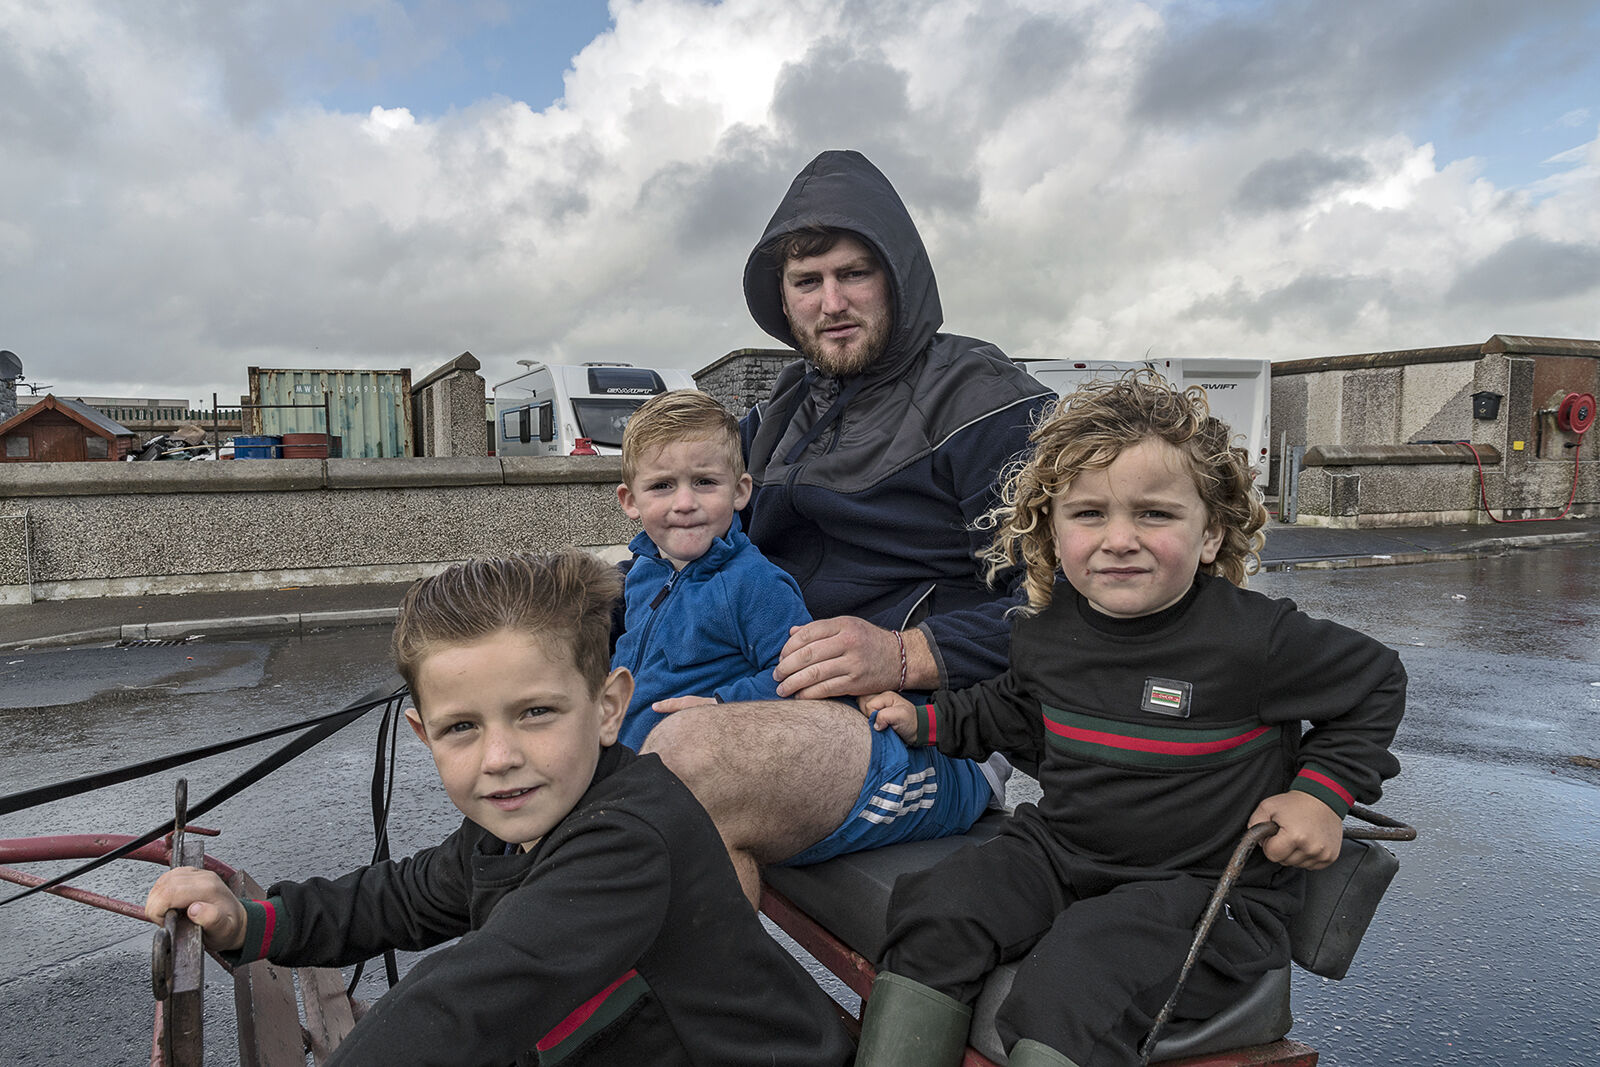 Delaneys on Sulky, Galway, Ireland 2019